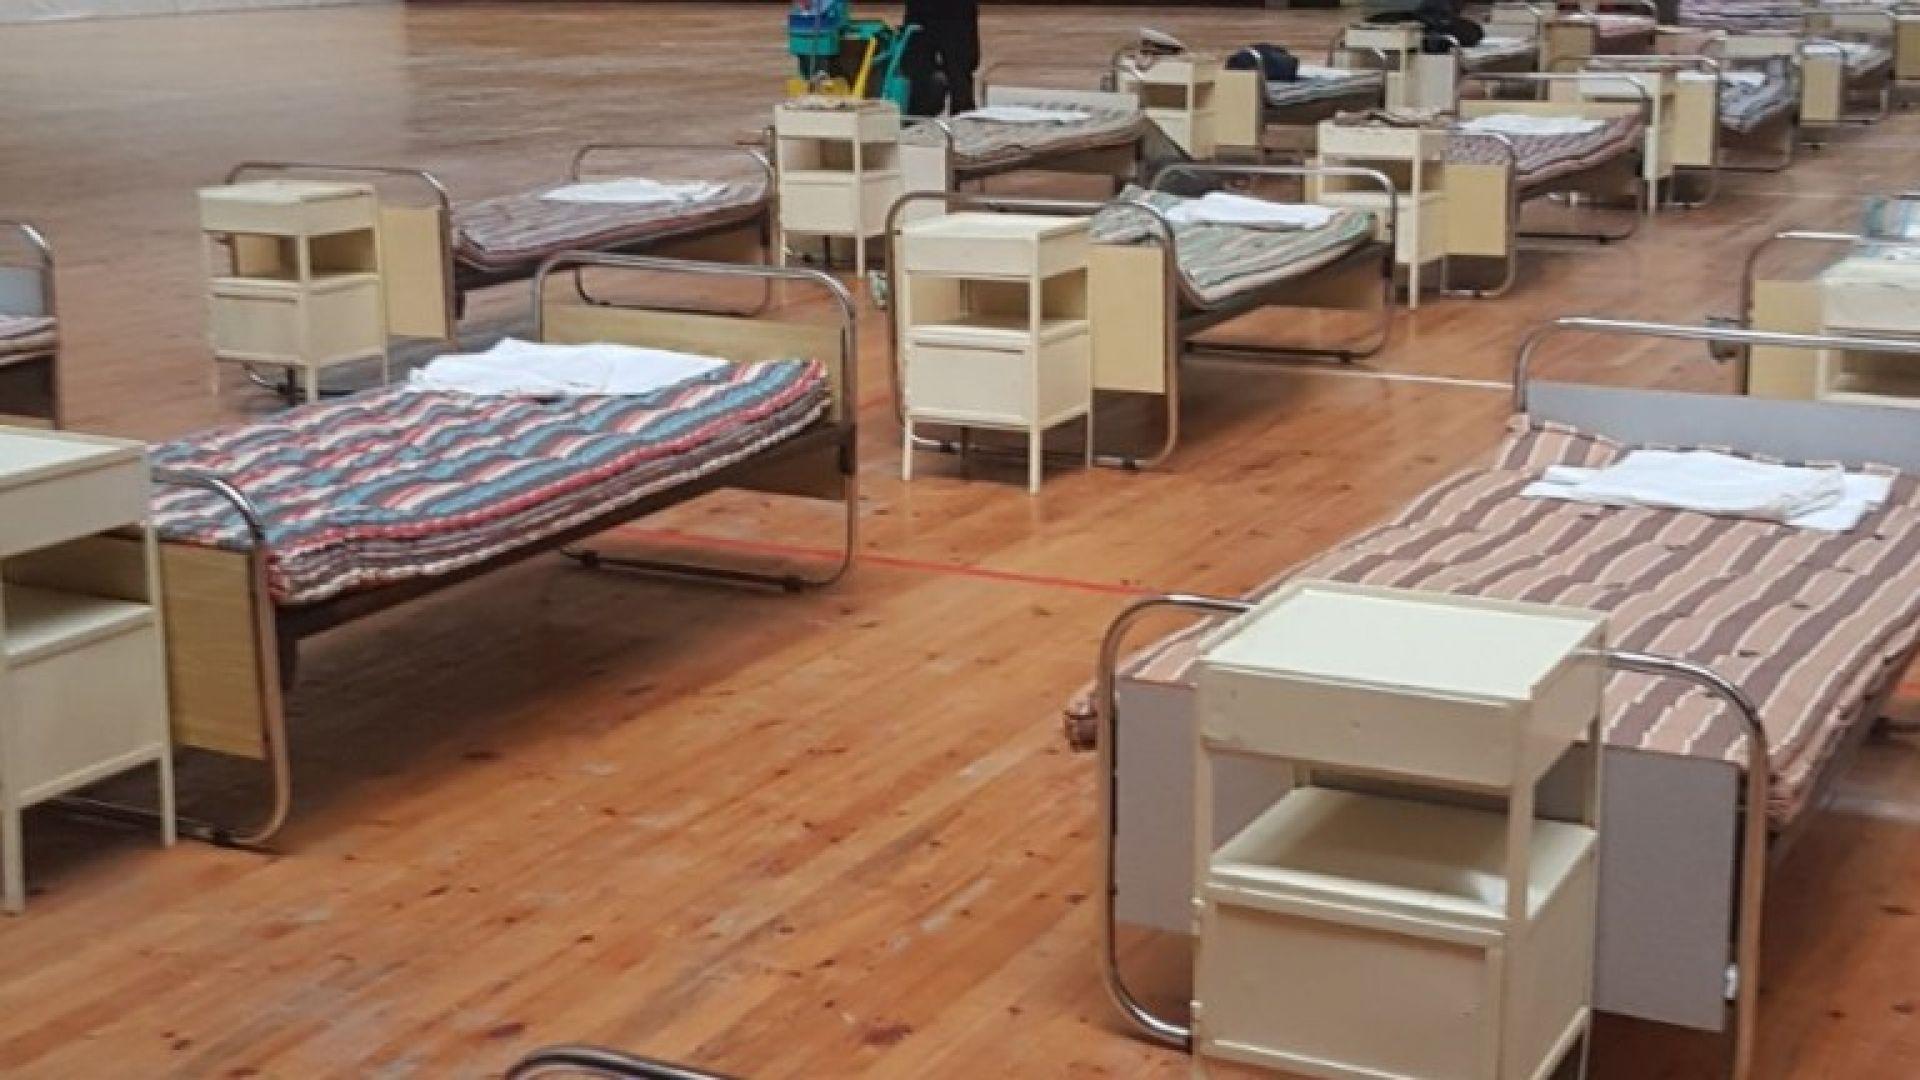 Двете полеви болници - в Пловдив и Русе, са демонтирани,